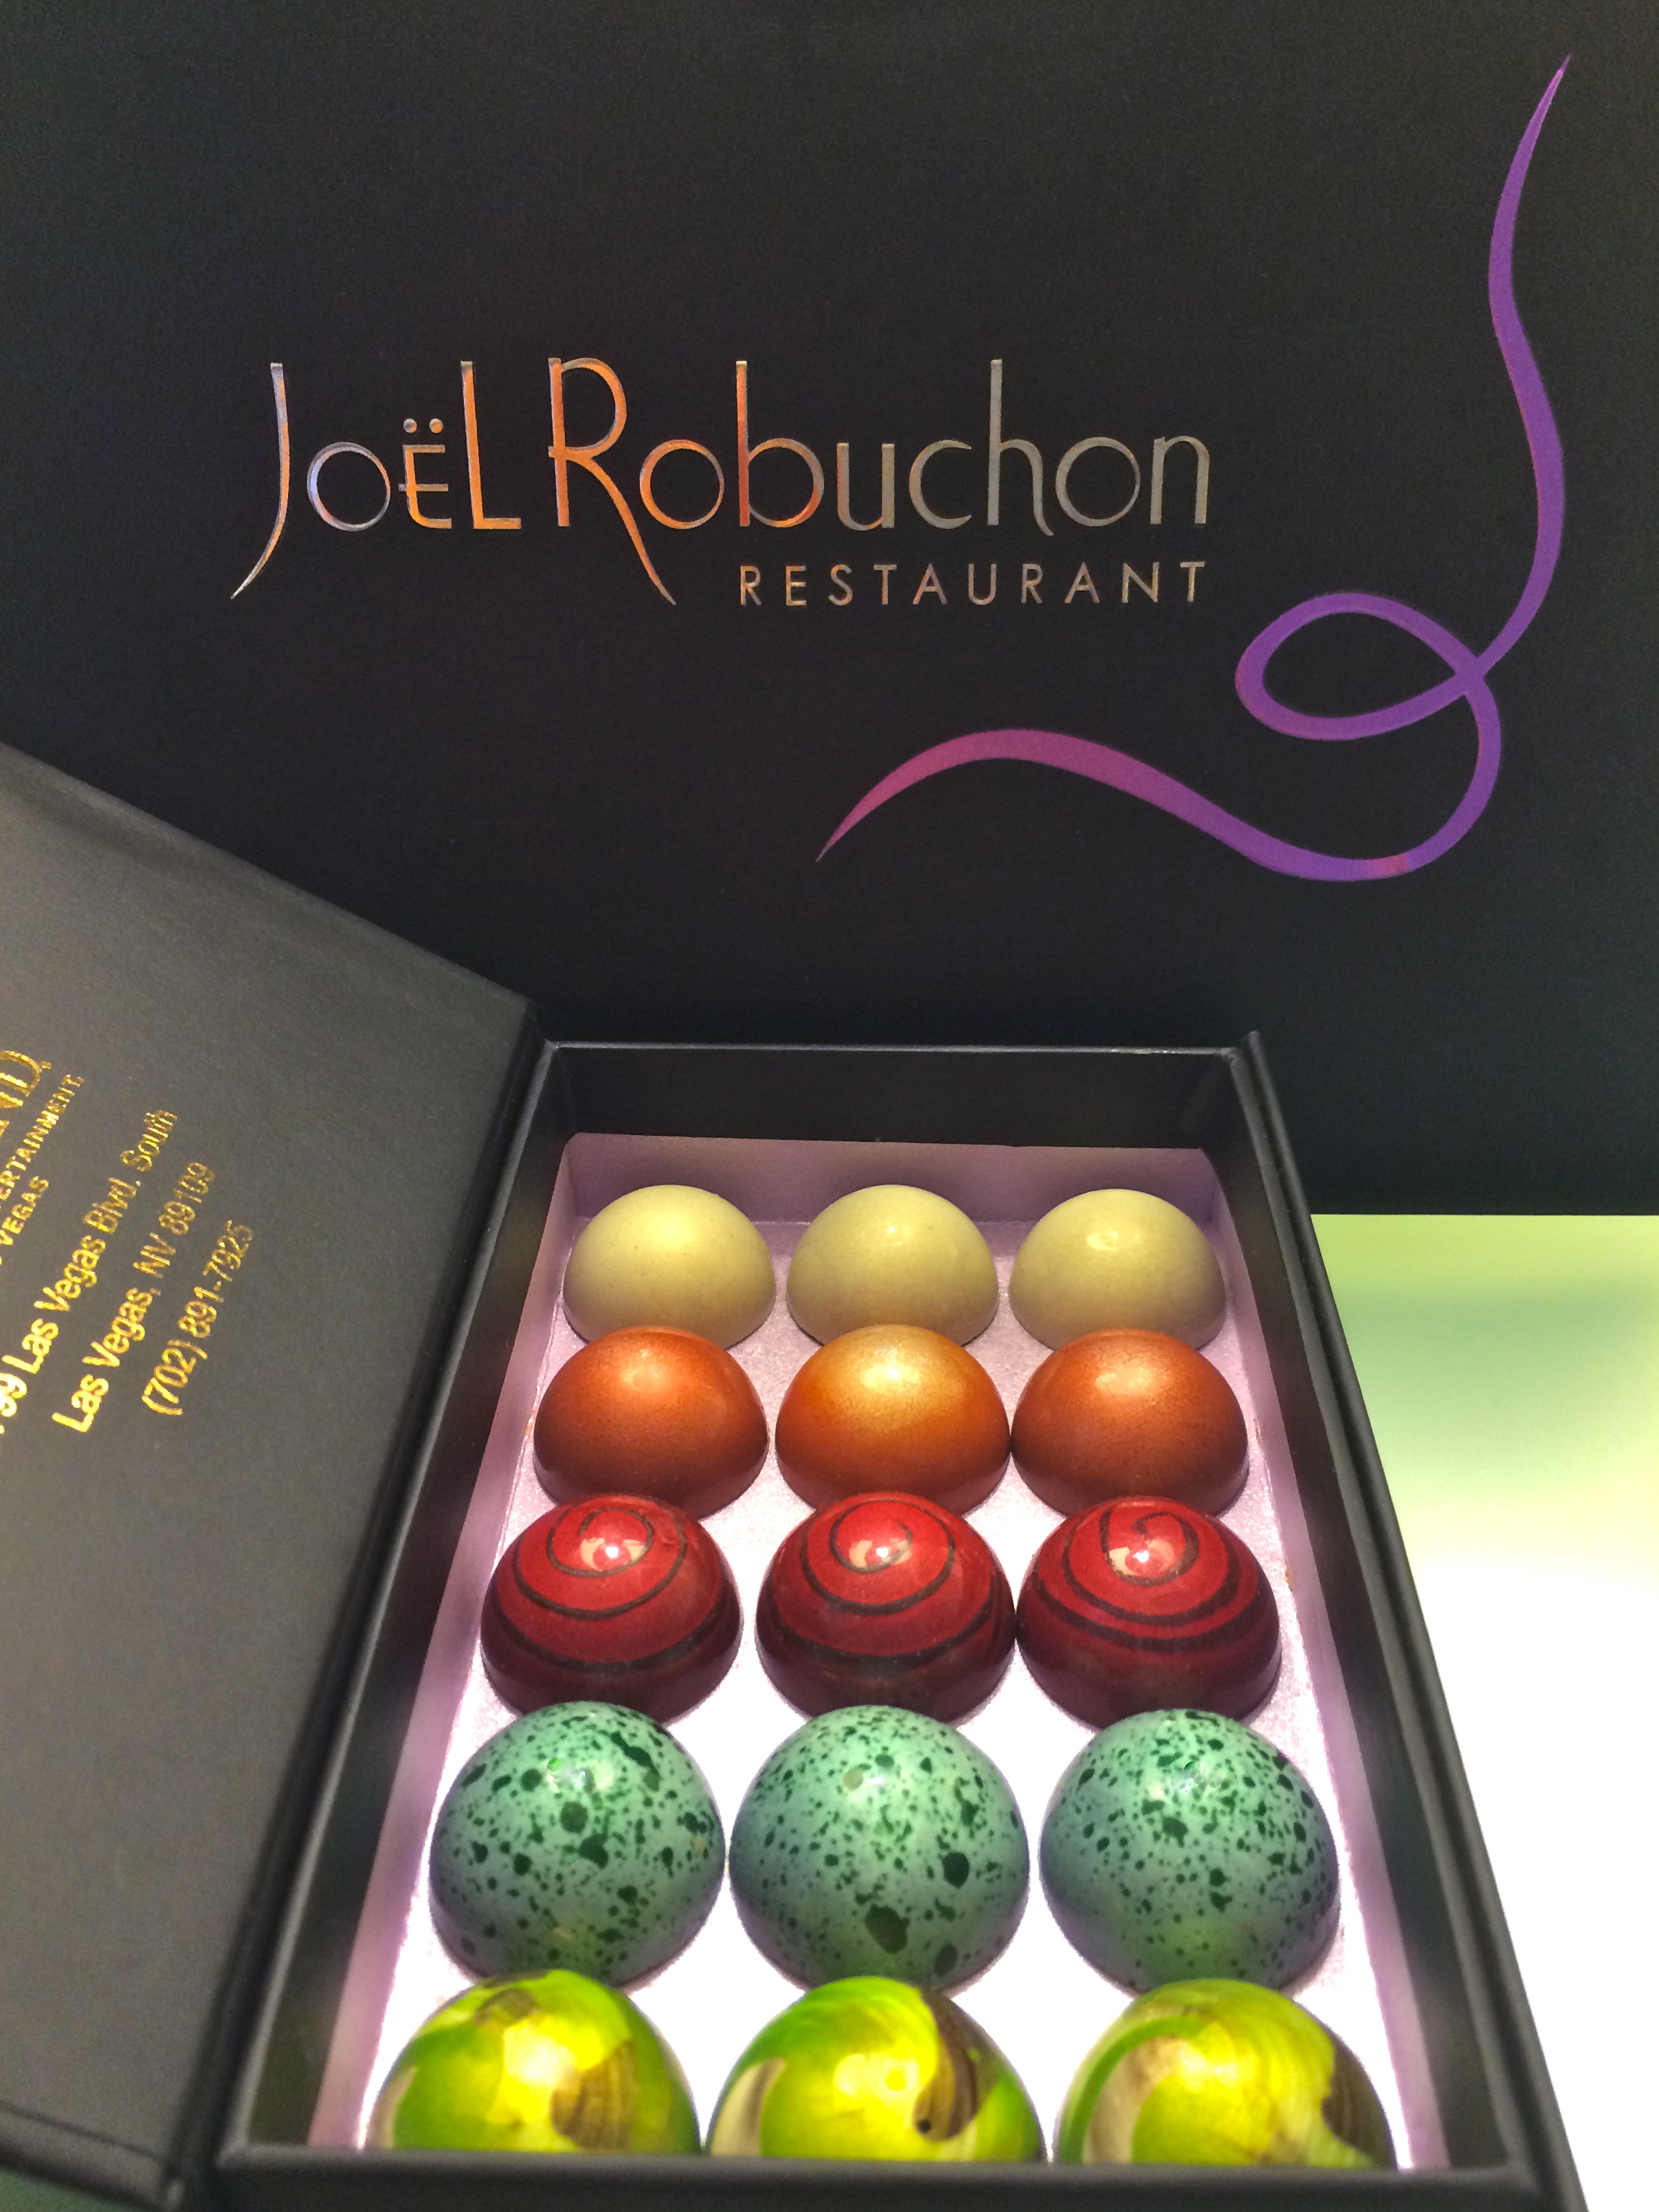 Joel Robuchon Restaurant Chocolates